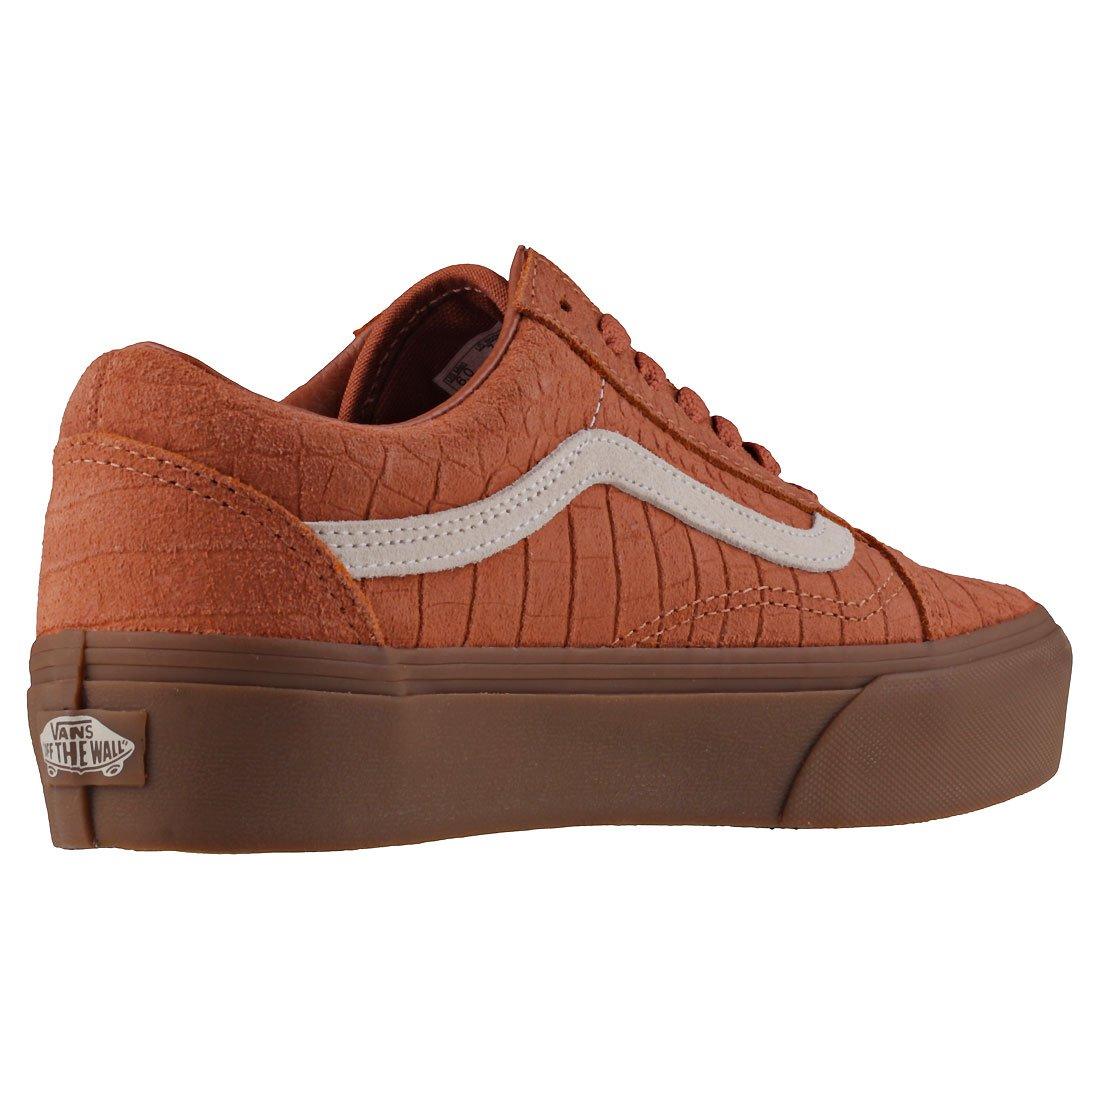 Vans Old Skool Platform Damen Sneakers Tan Gum 8 UK